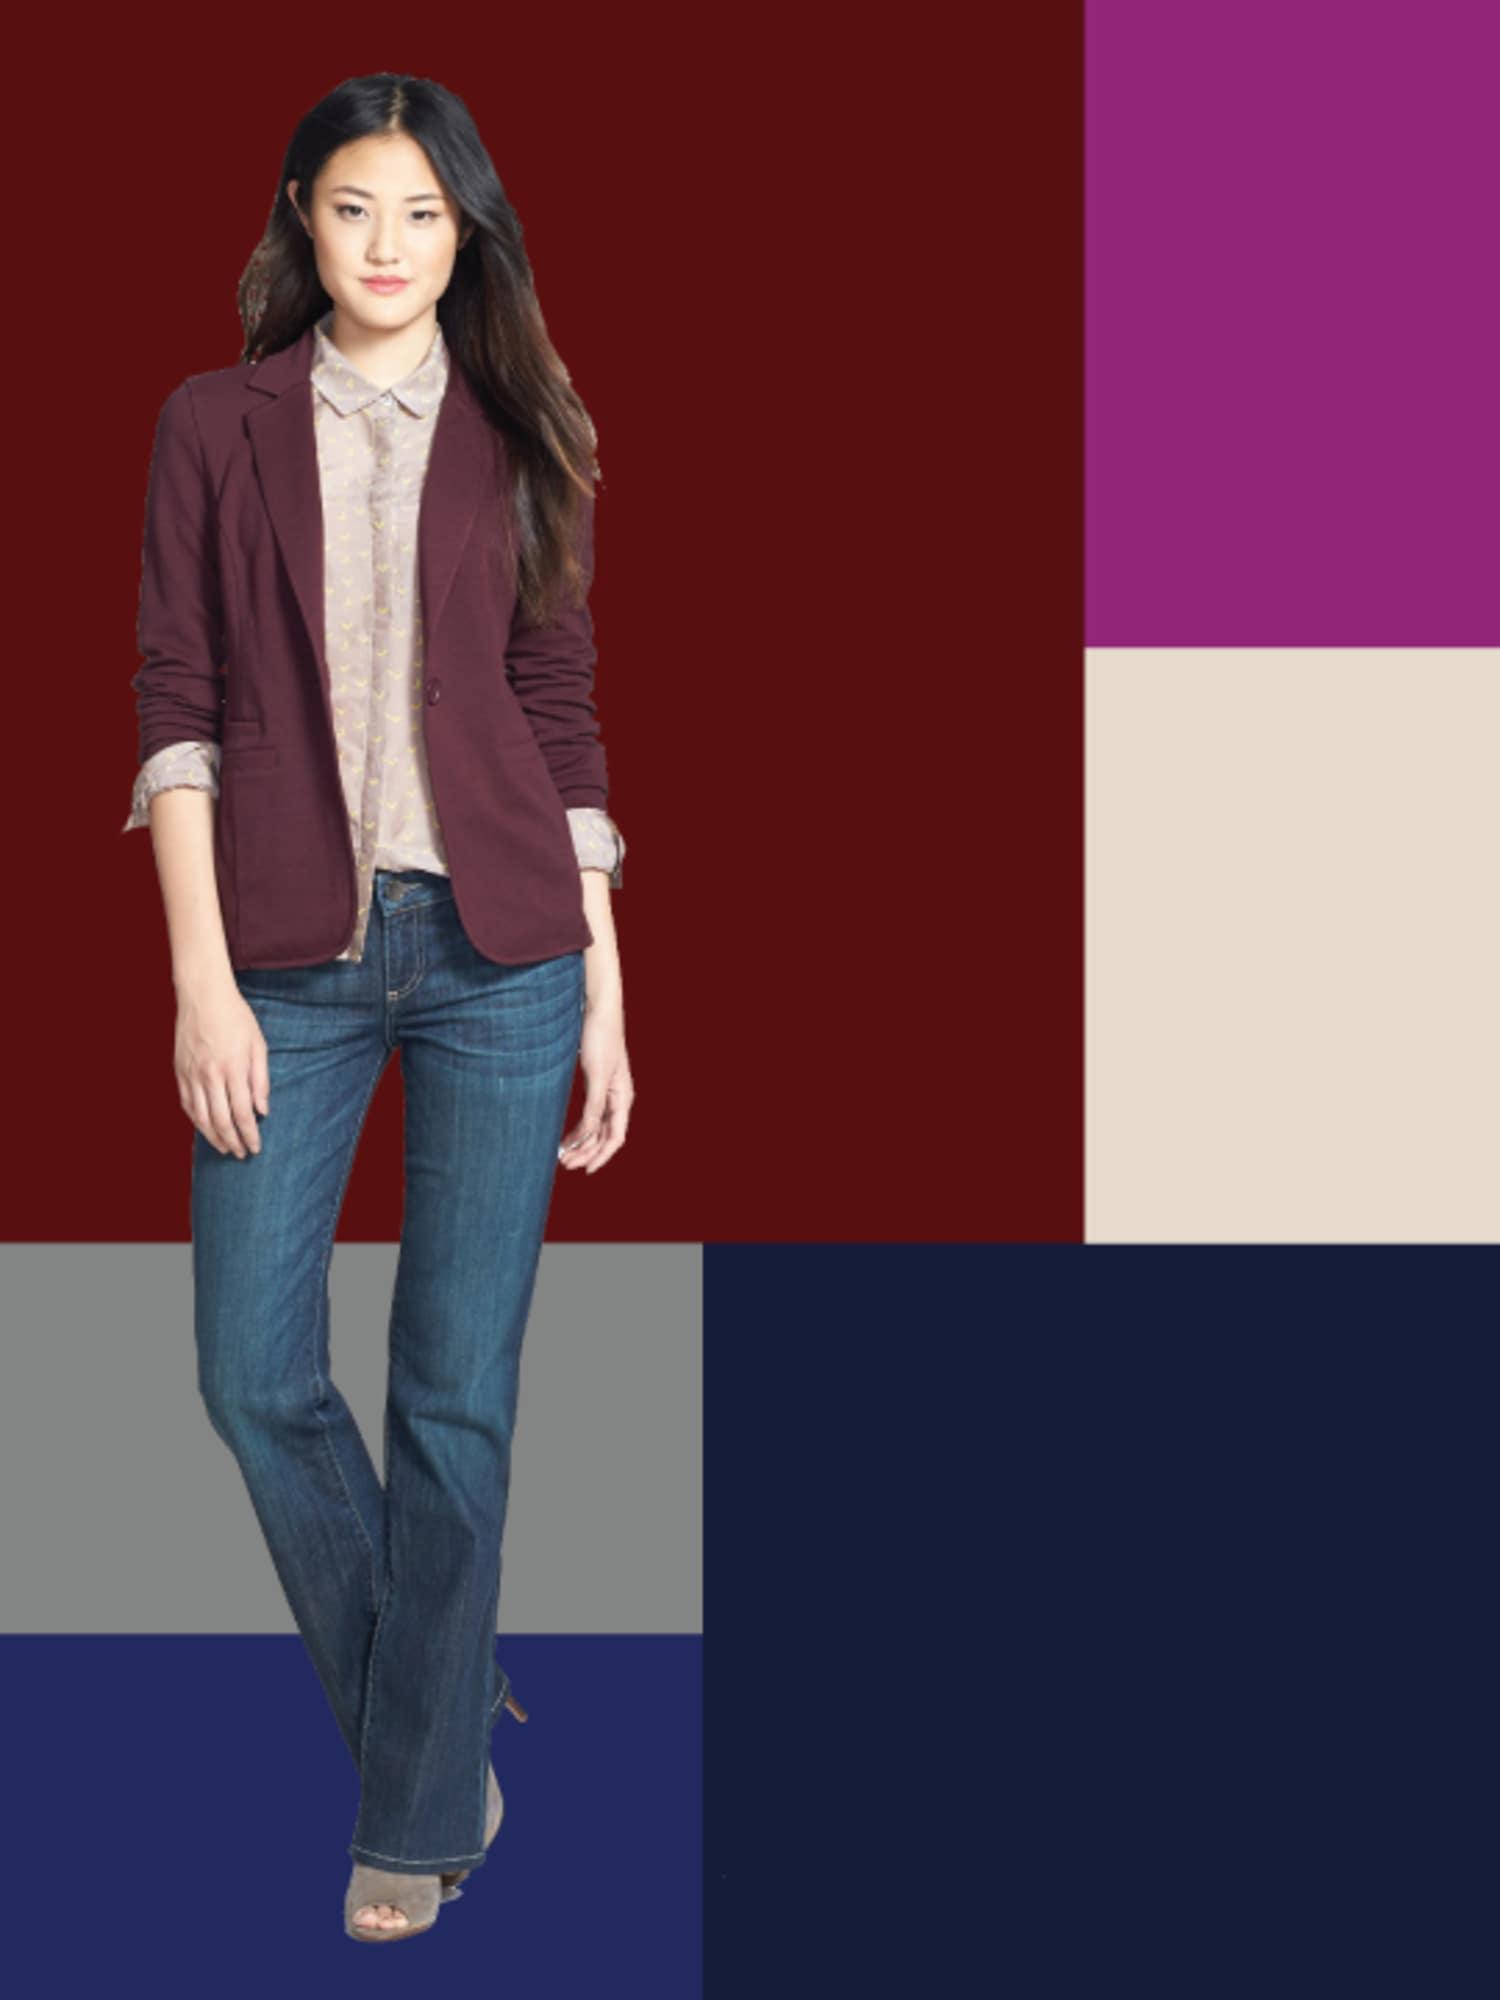 Fall Fashion Color Mix: Burgundy & Blue